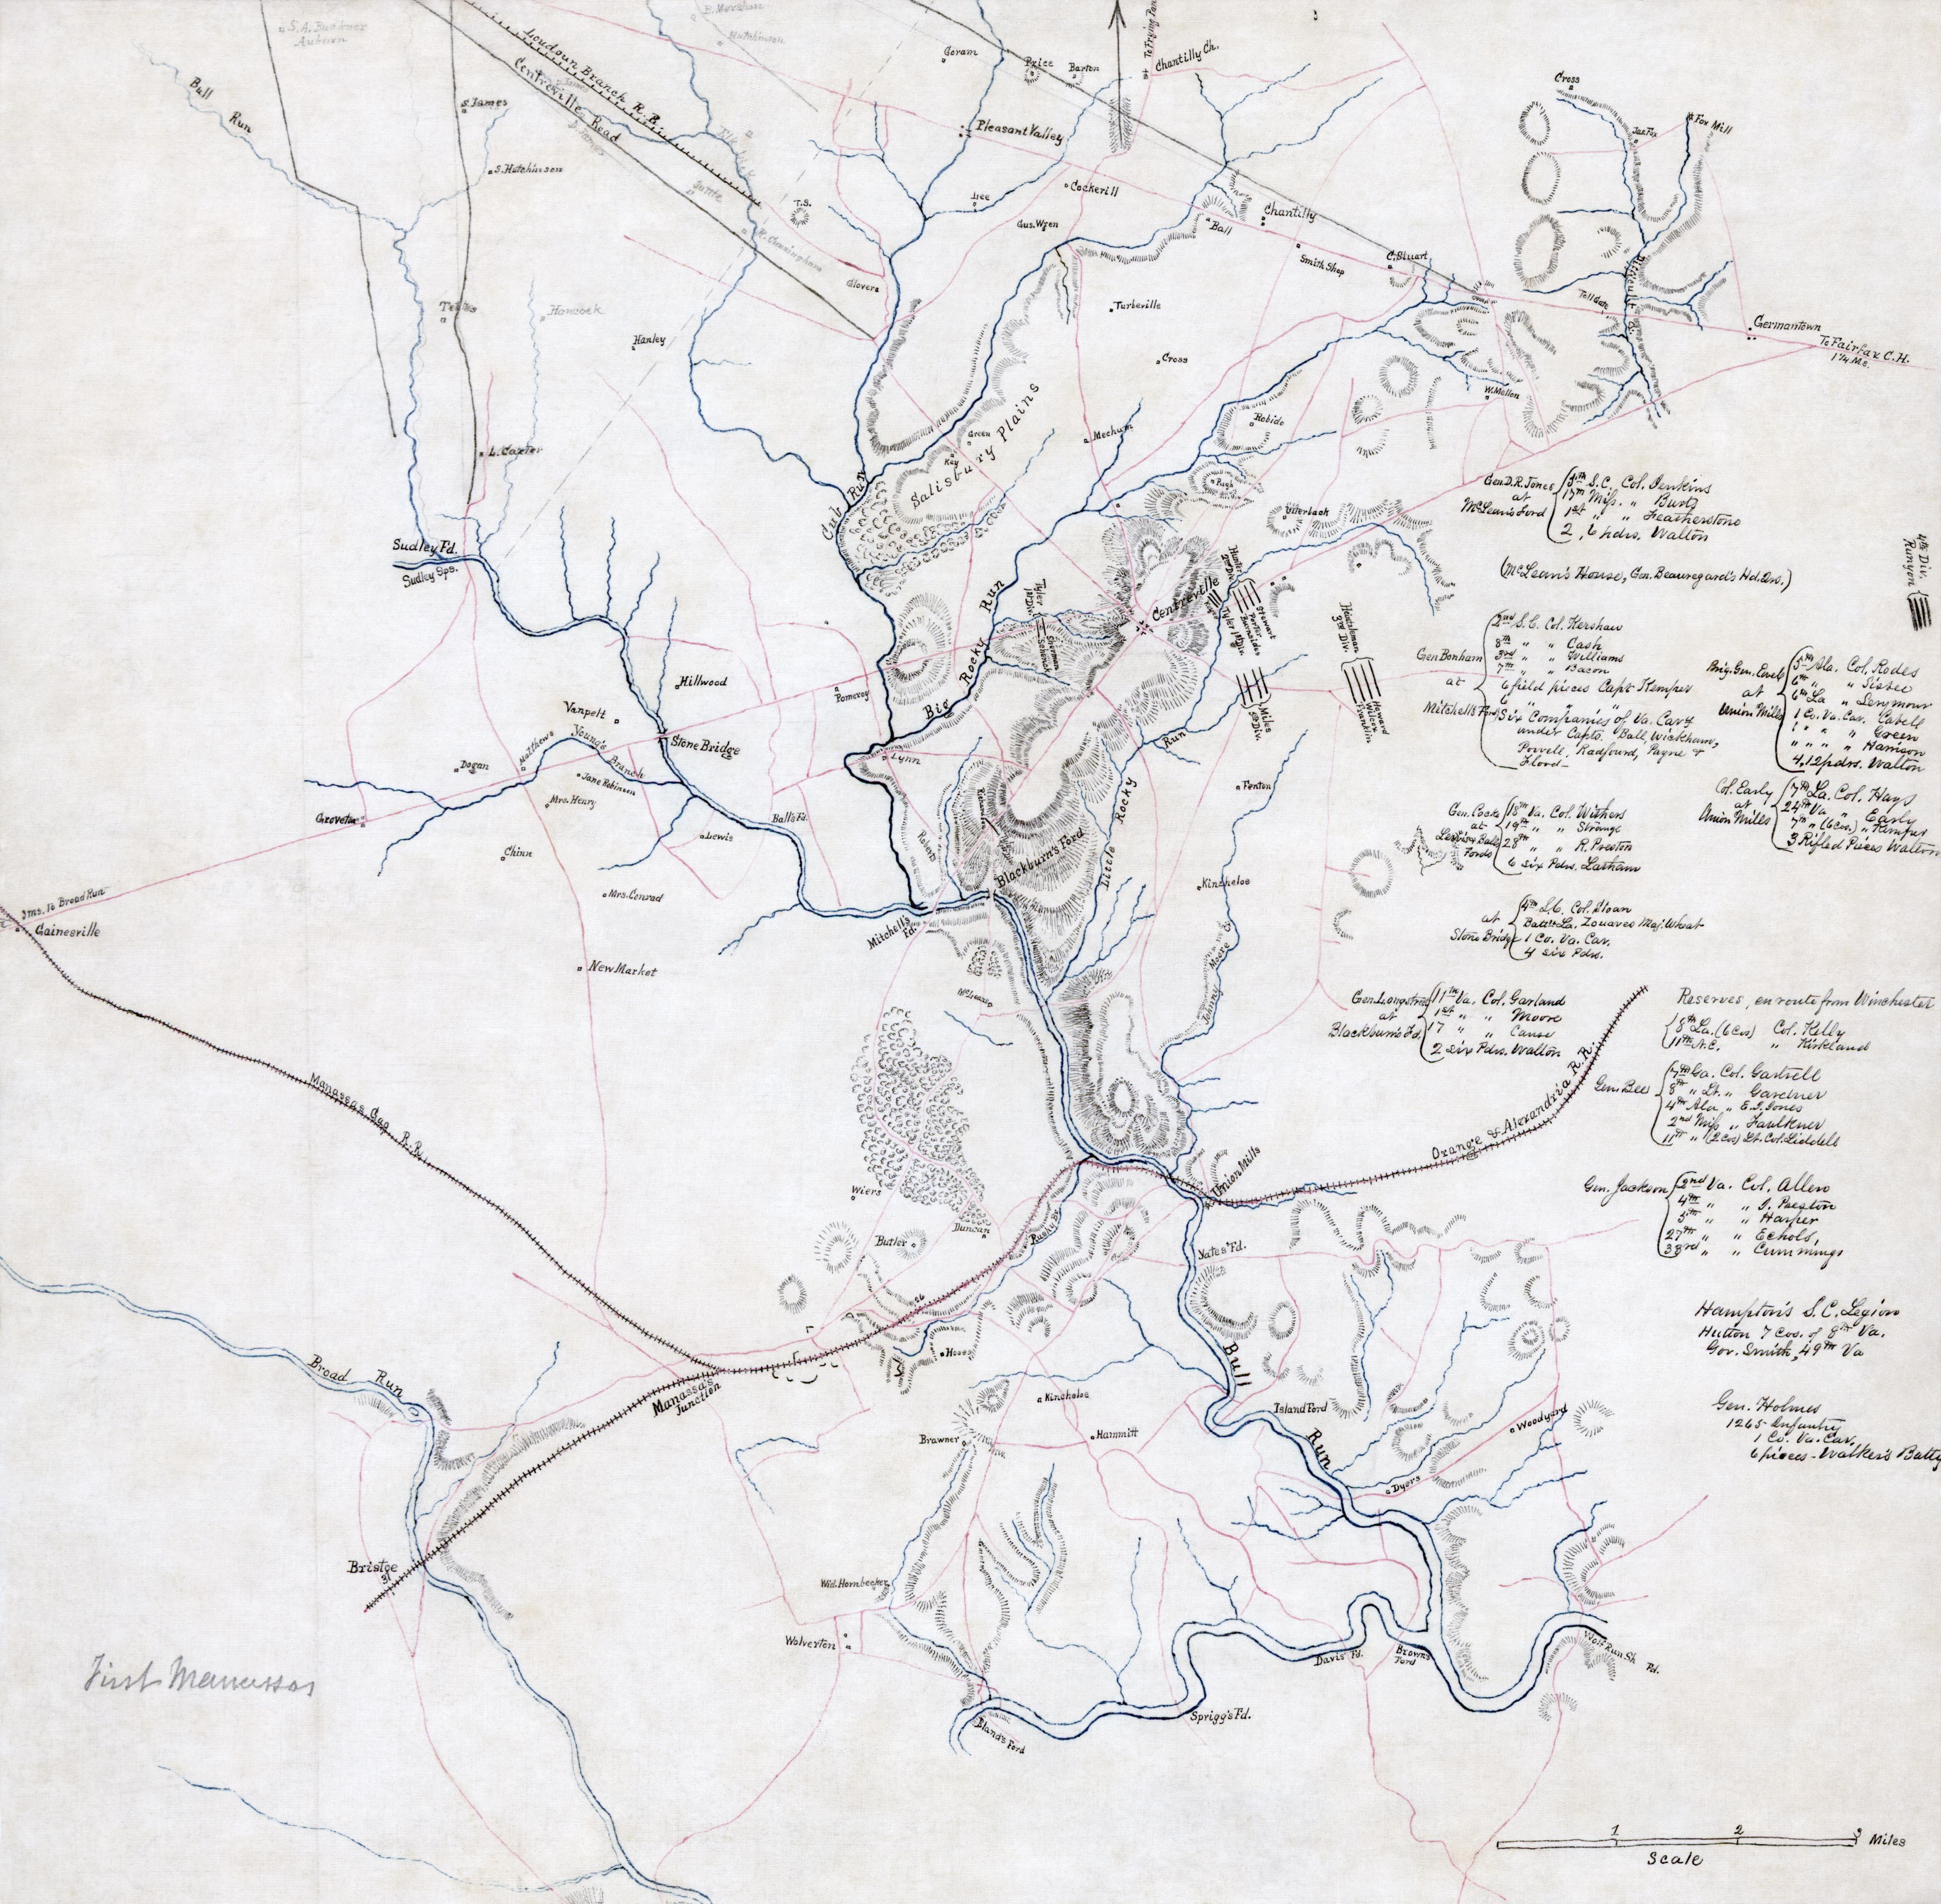 FileFirst Manassas Mapjpg Wikipedia - Us civial war map wiki